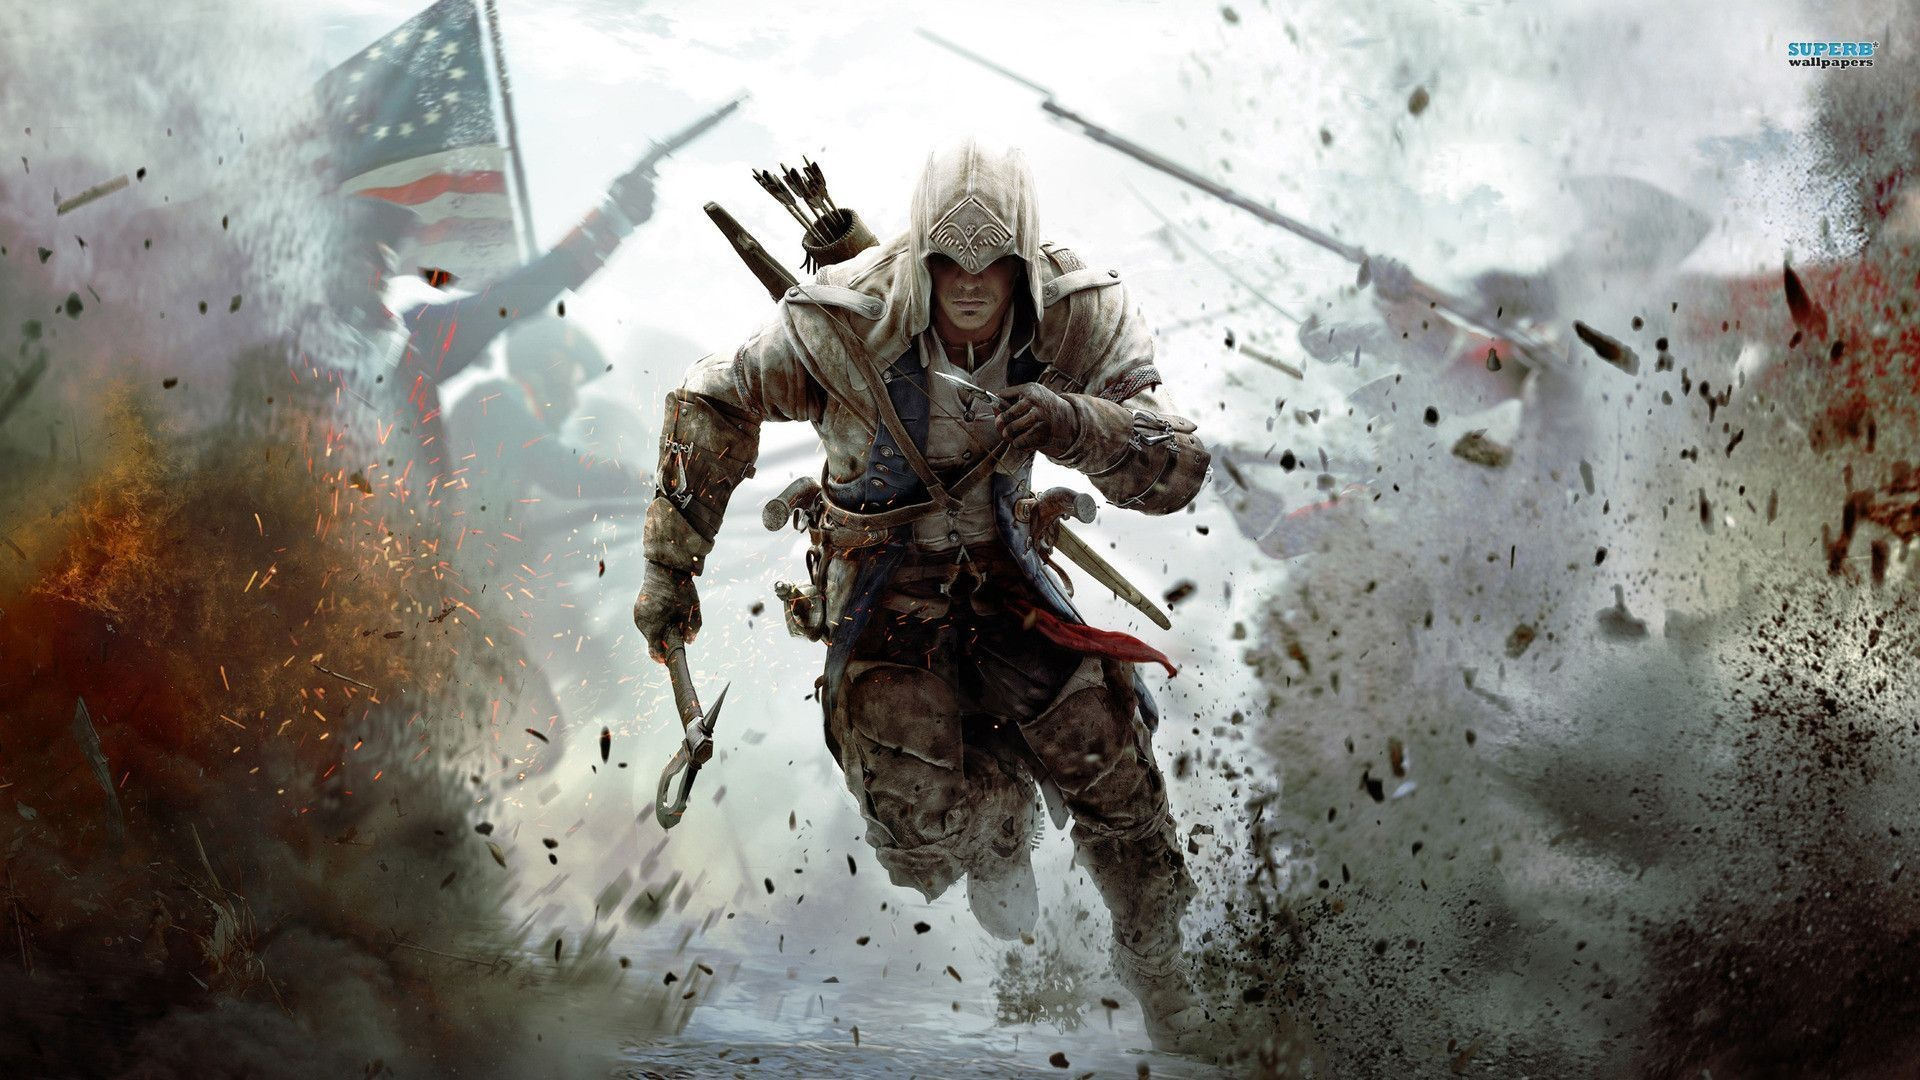 Assassins Creed Rogue HD desktop wallpaper   HD Wallpapers   Pinterest   Assassins  creed, Hd wallpaper and Wallpaper